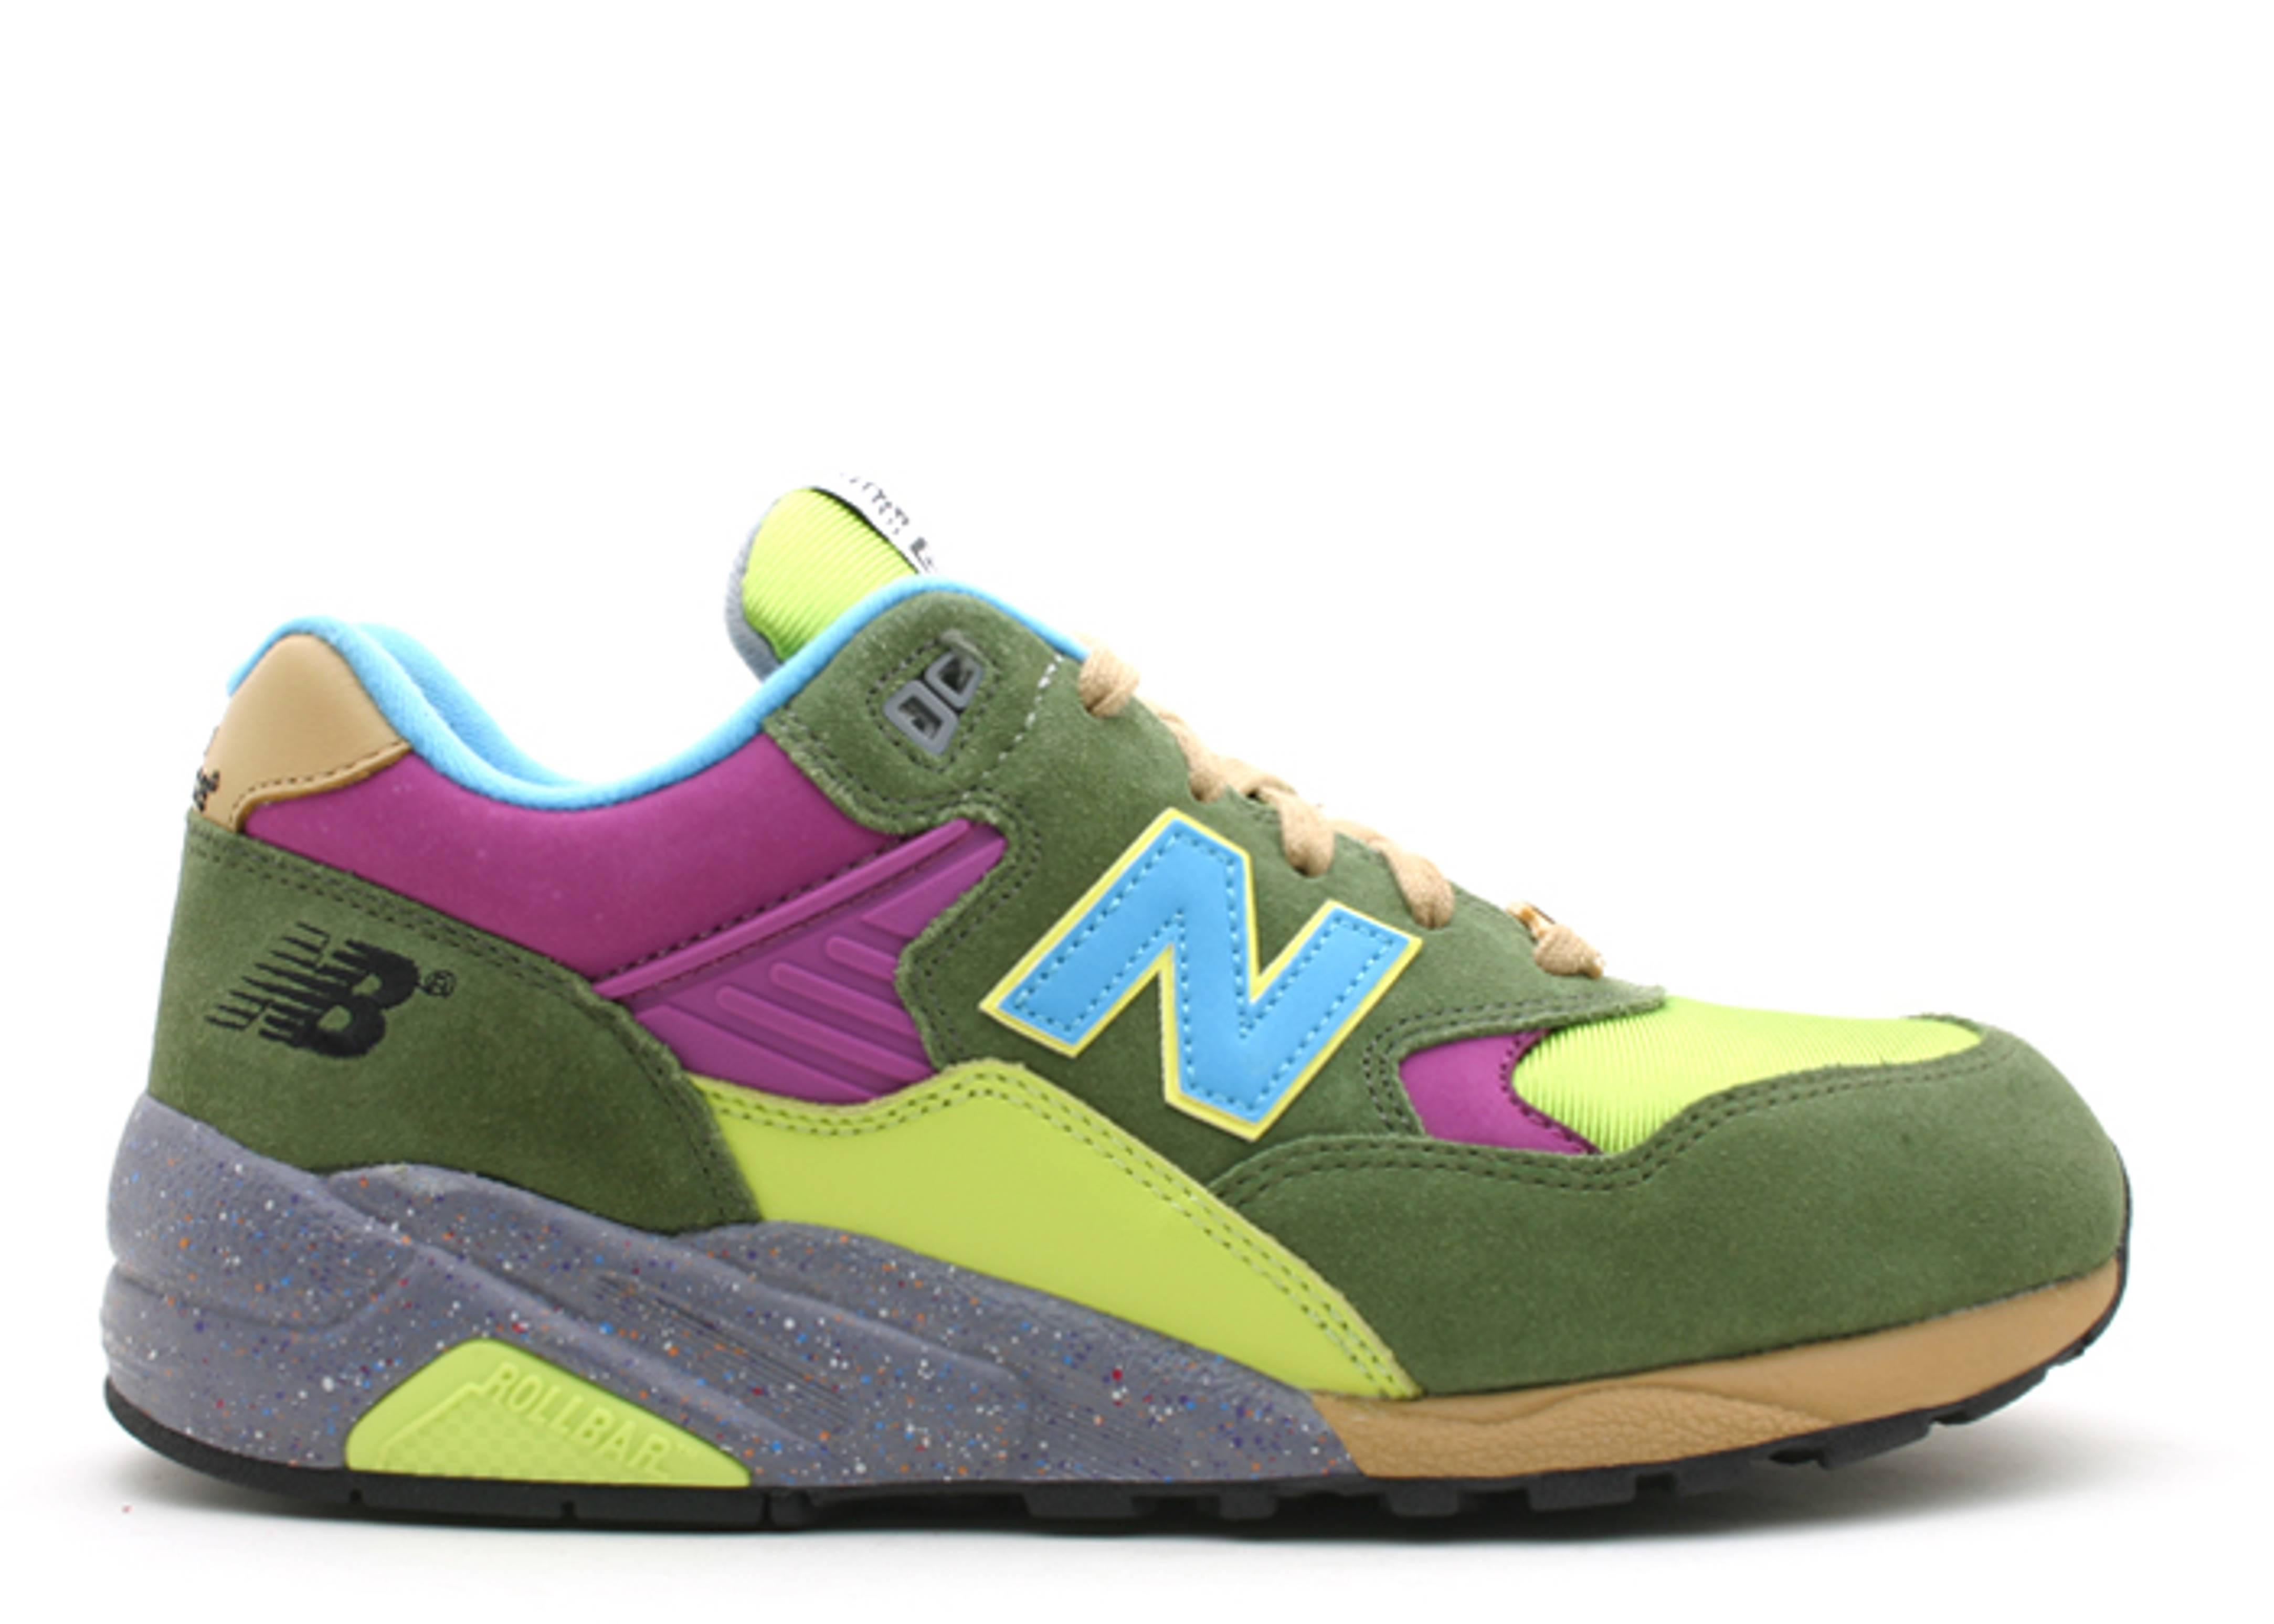 2new balance mt 580